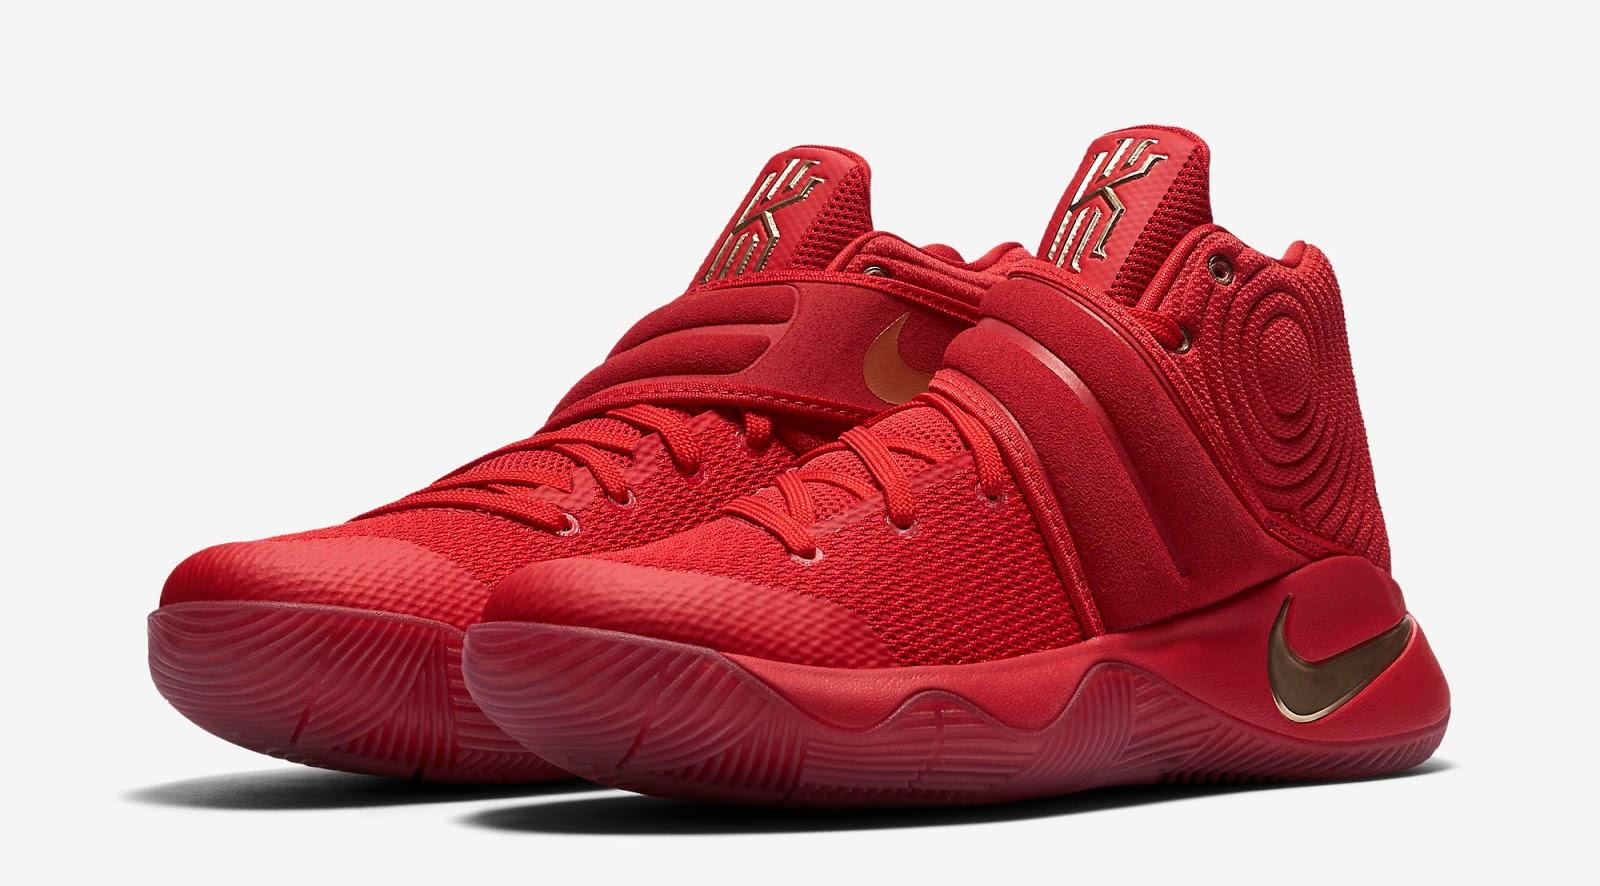 detailed look 98af7 c54ea ajordanxi Your  1 Source For Sneaker Release Dates  Nike Kyrie 2 LMTD